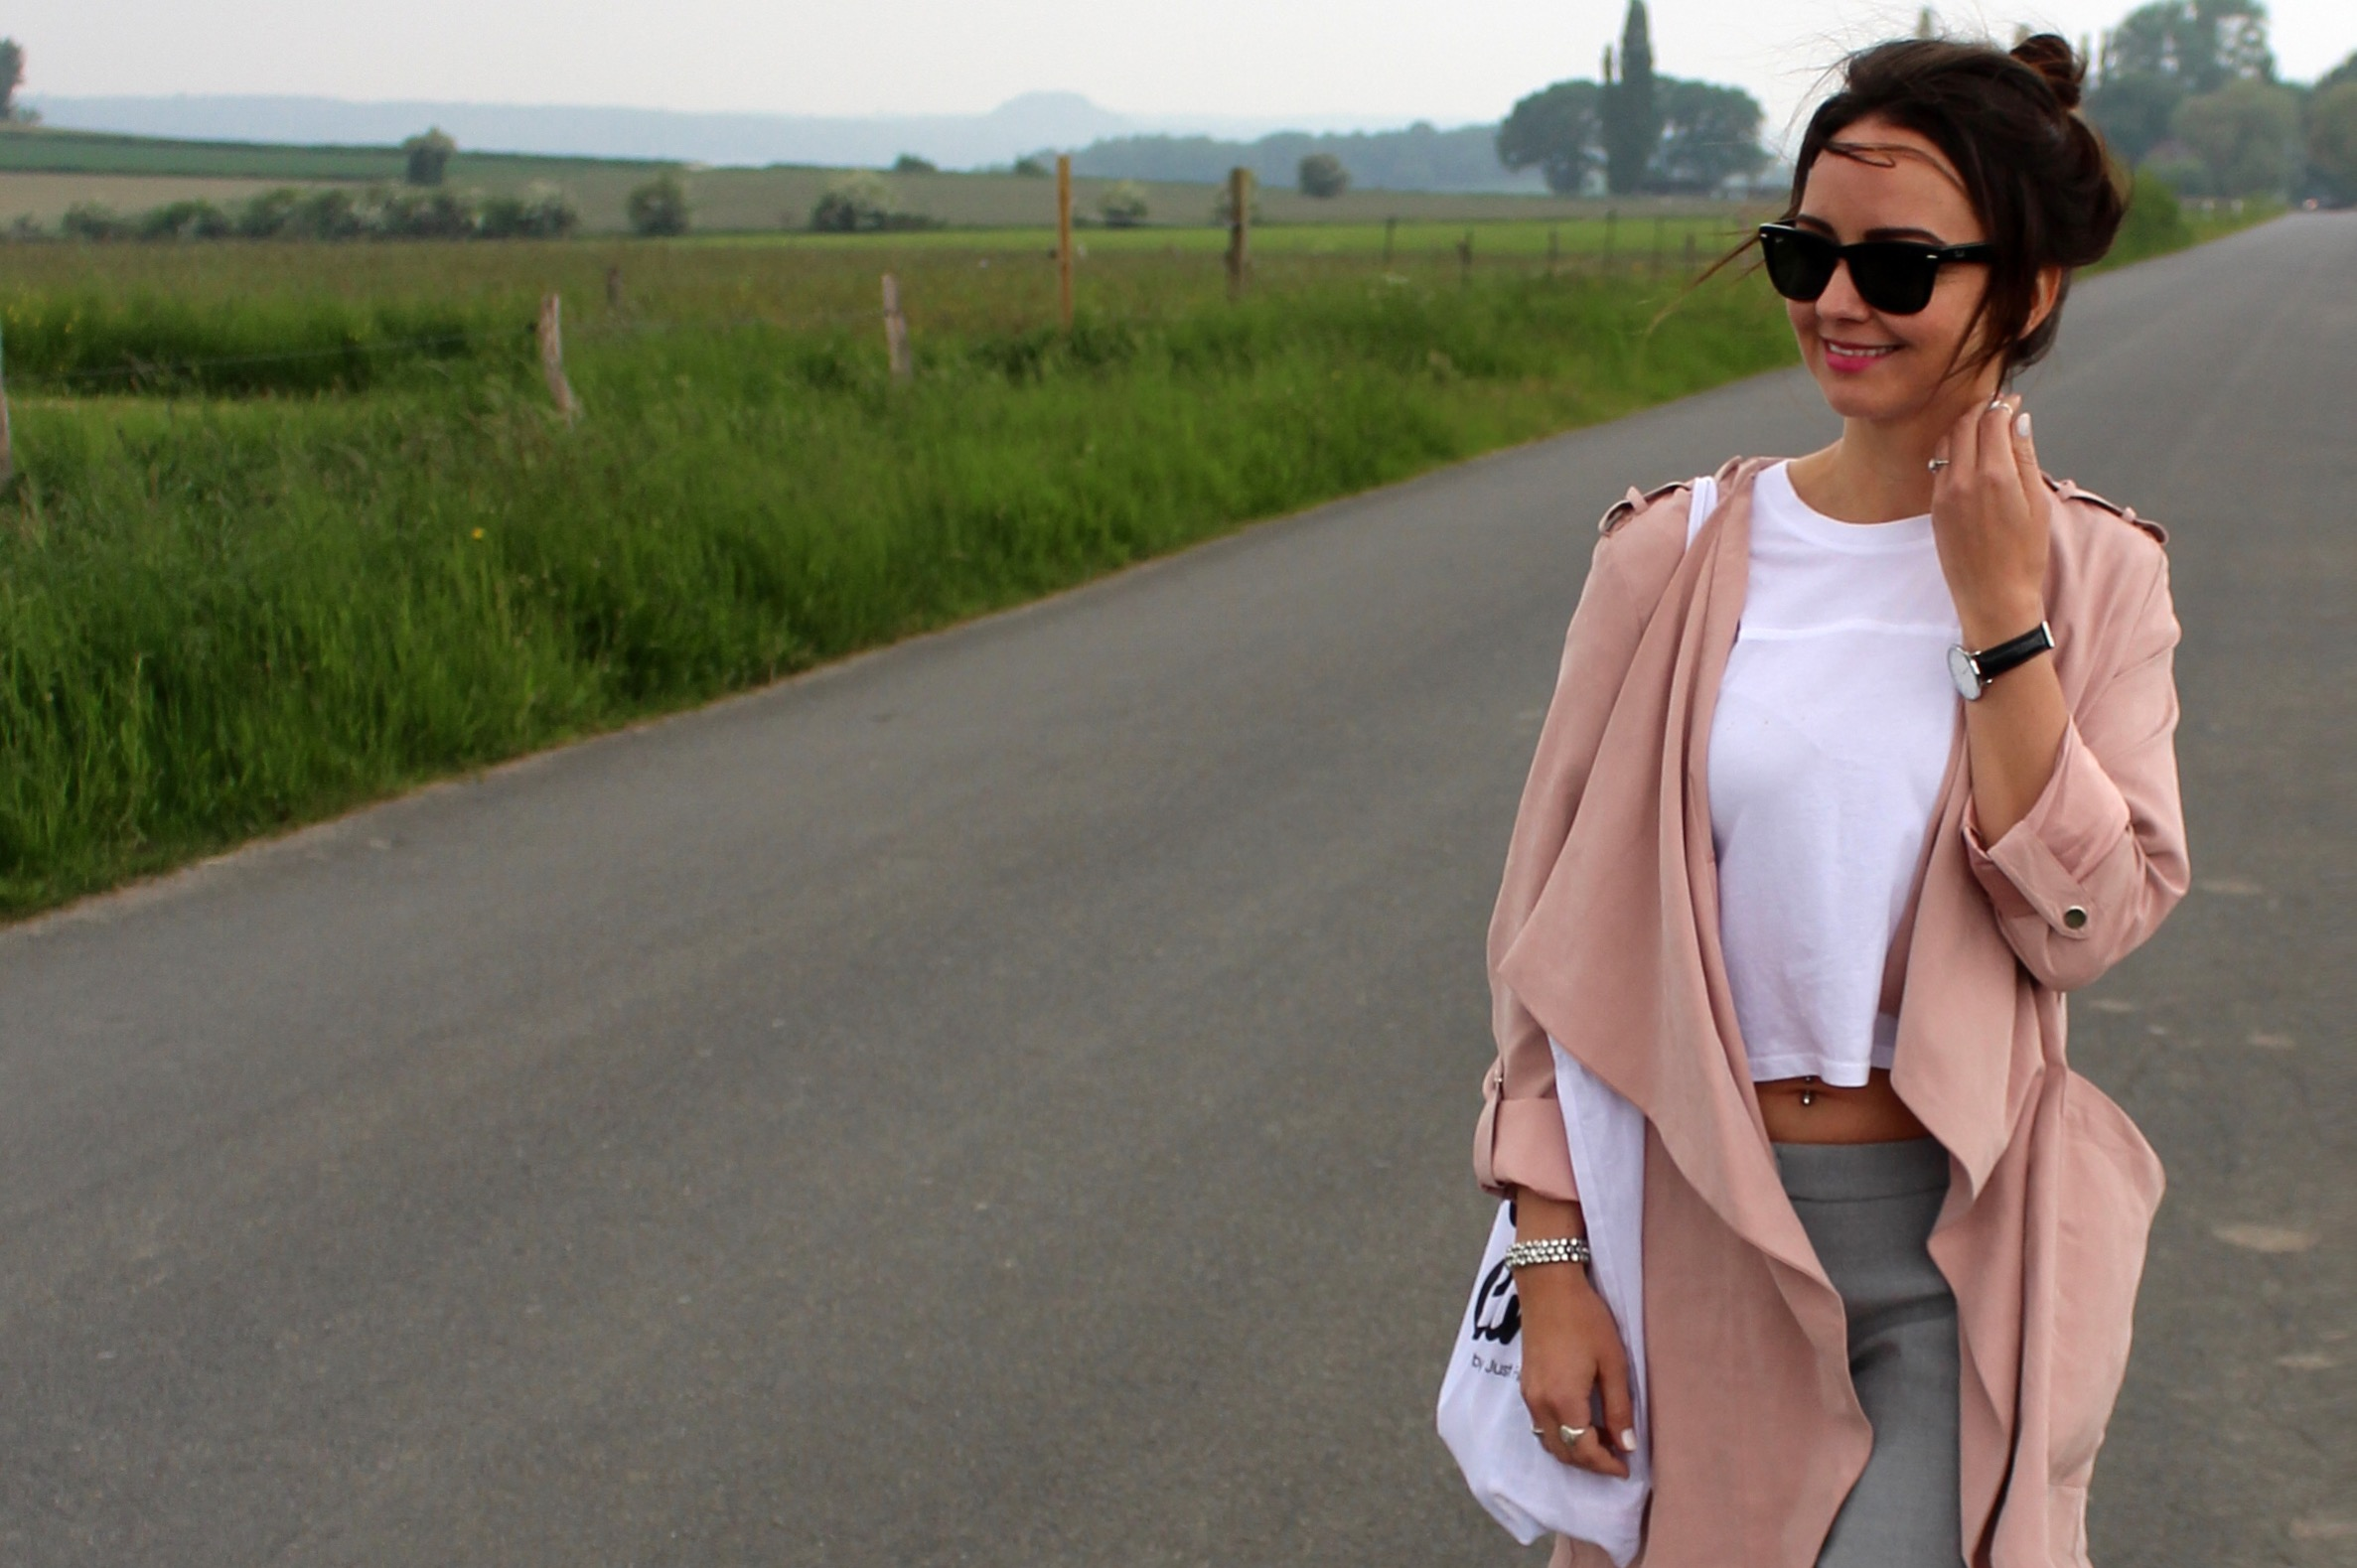 Fashioncircuz by Jenny img_6881 EIN GANZ NORMALER SAMSTAG